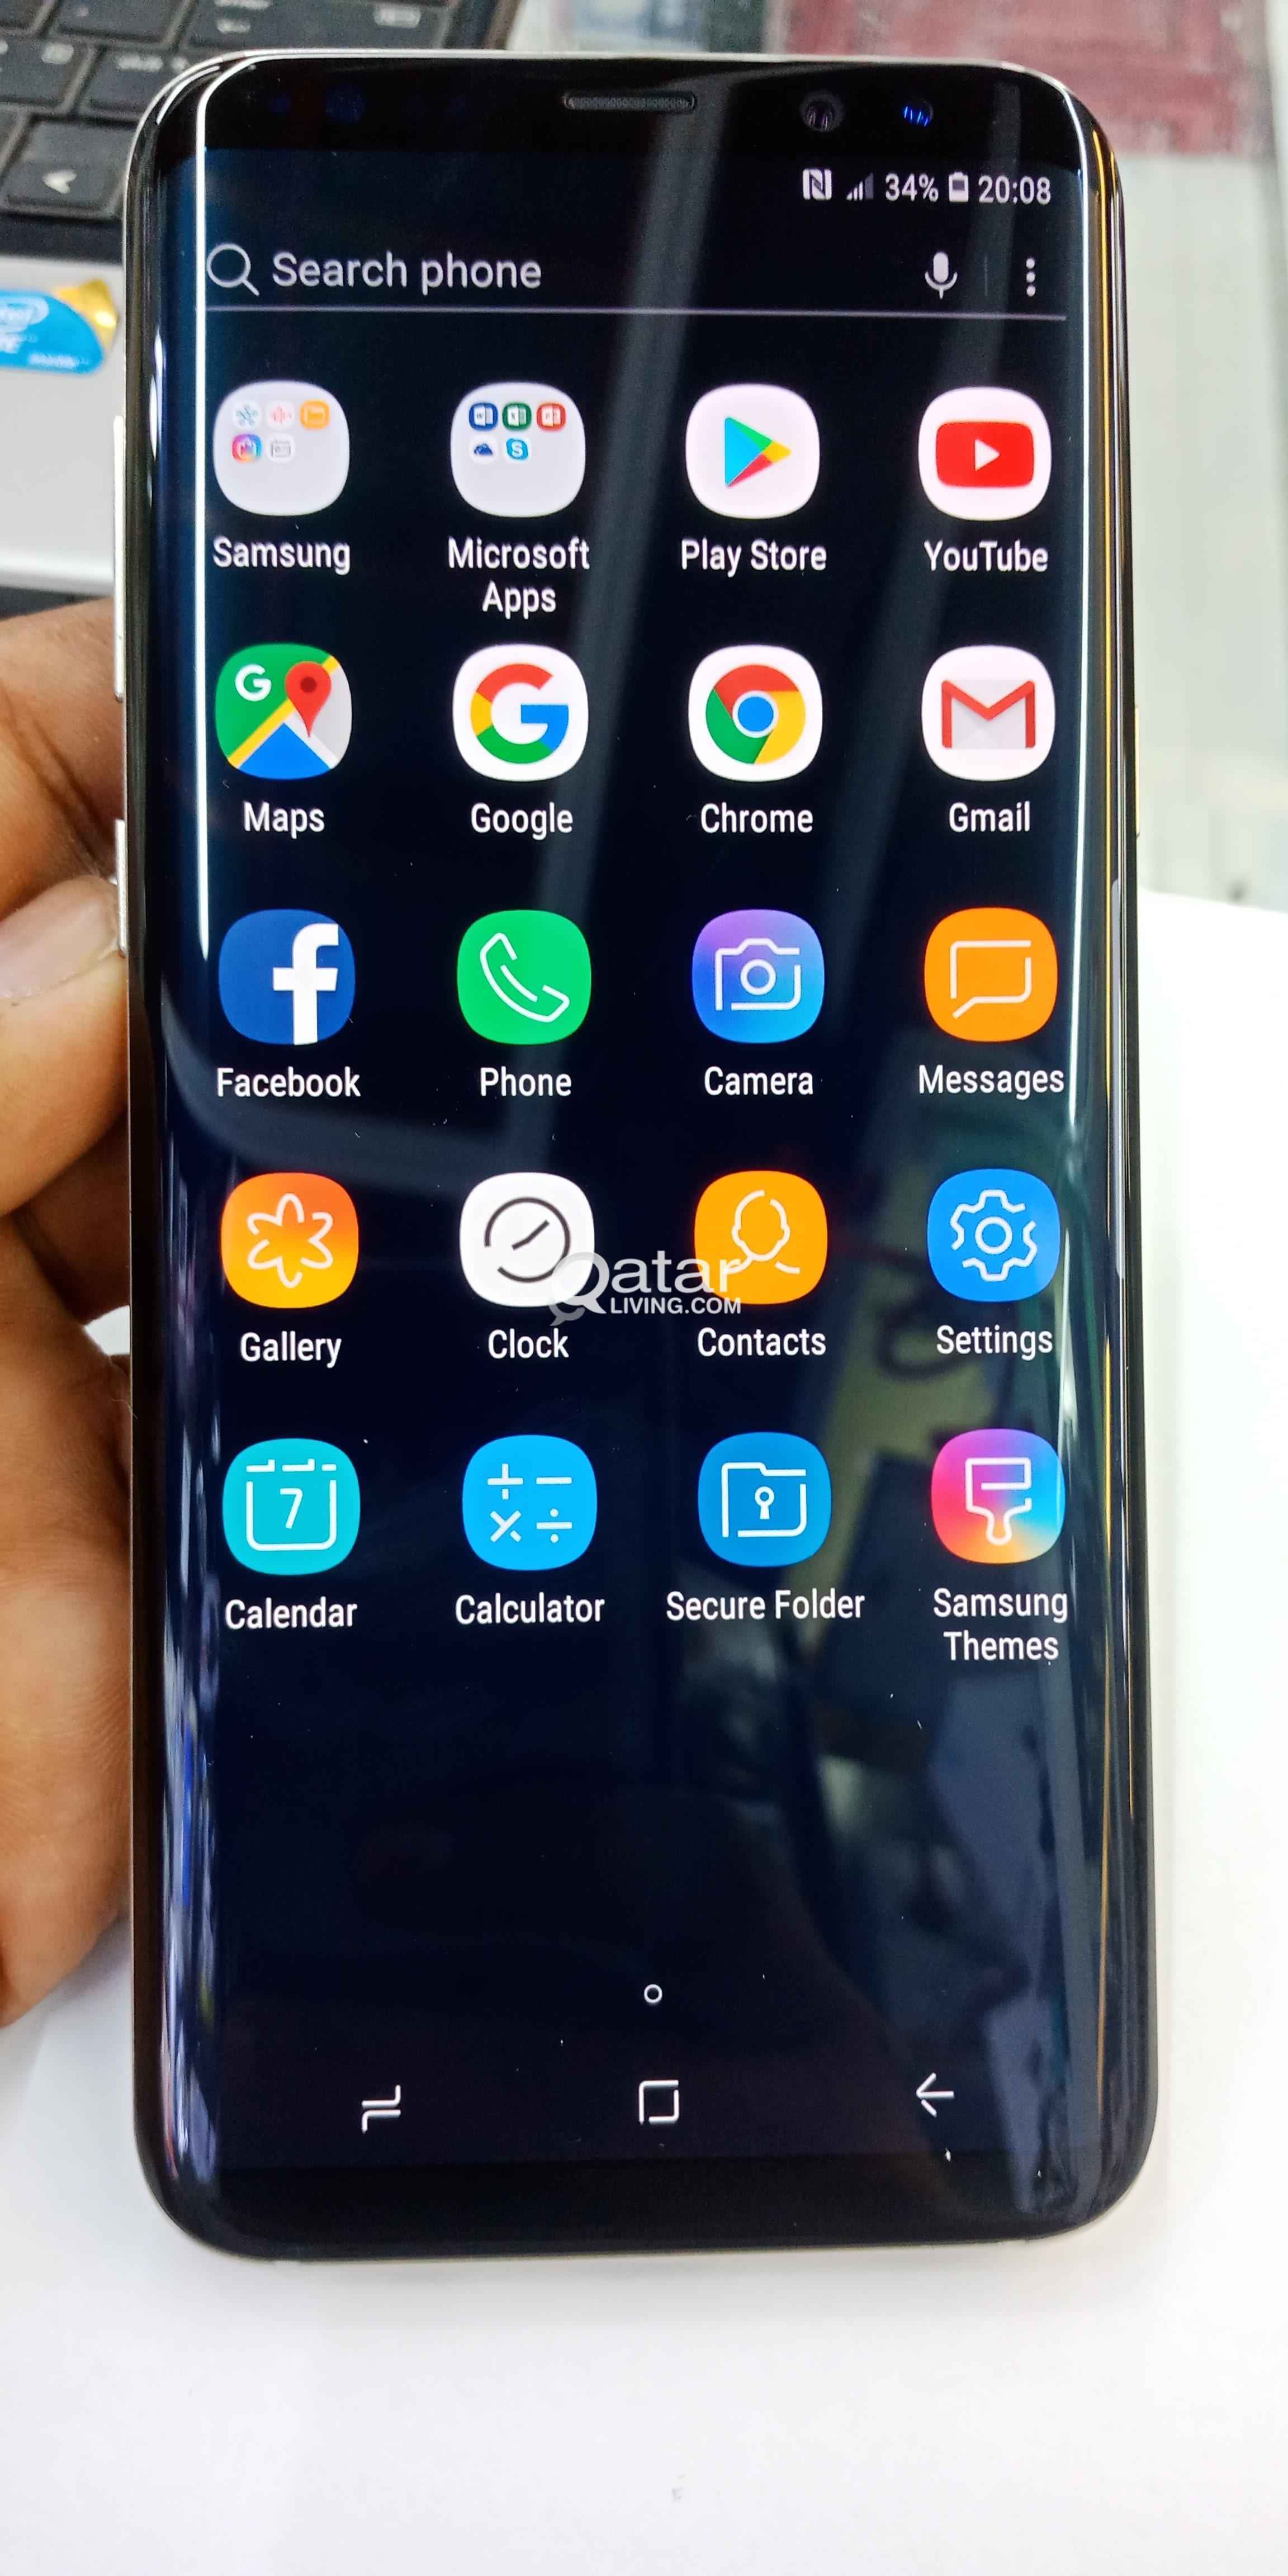 Samsung S8 edge 4/32 gb   Qatar Living